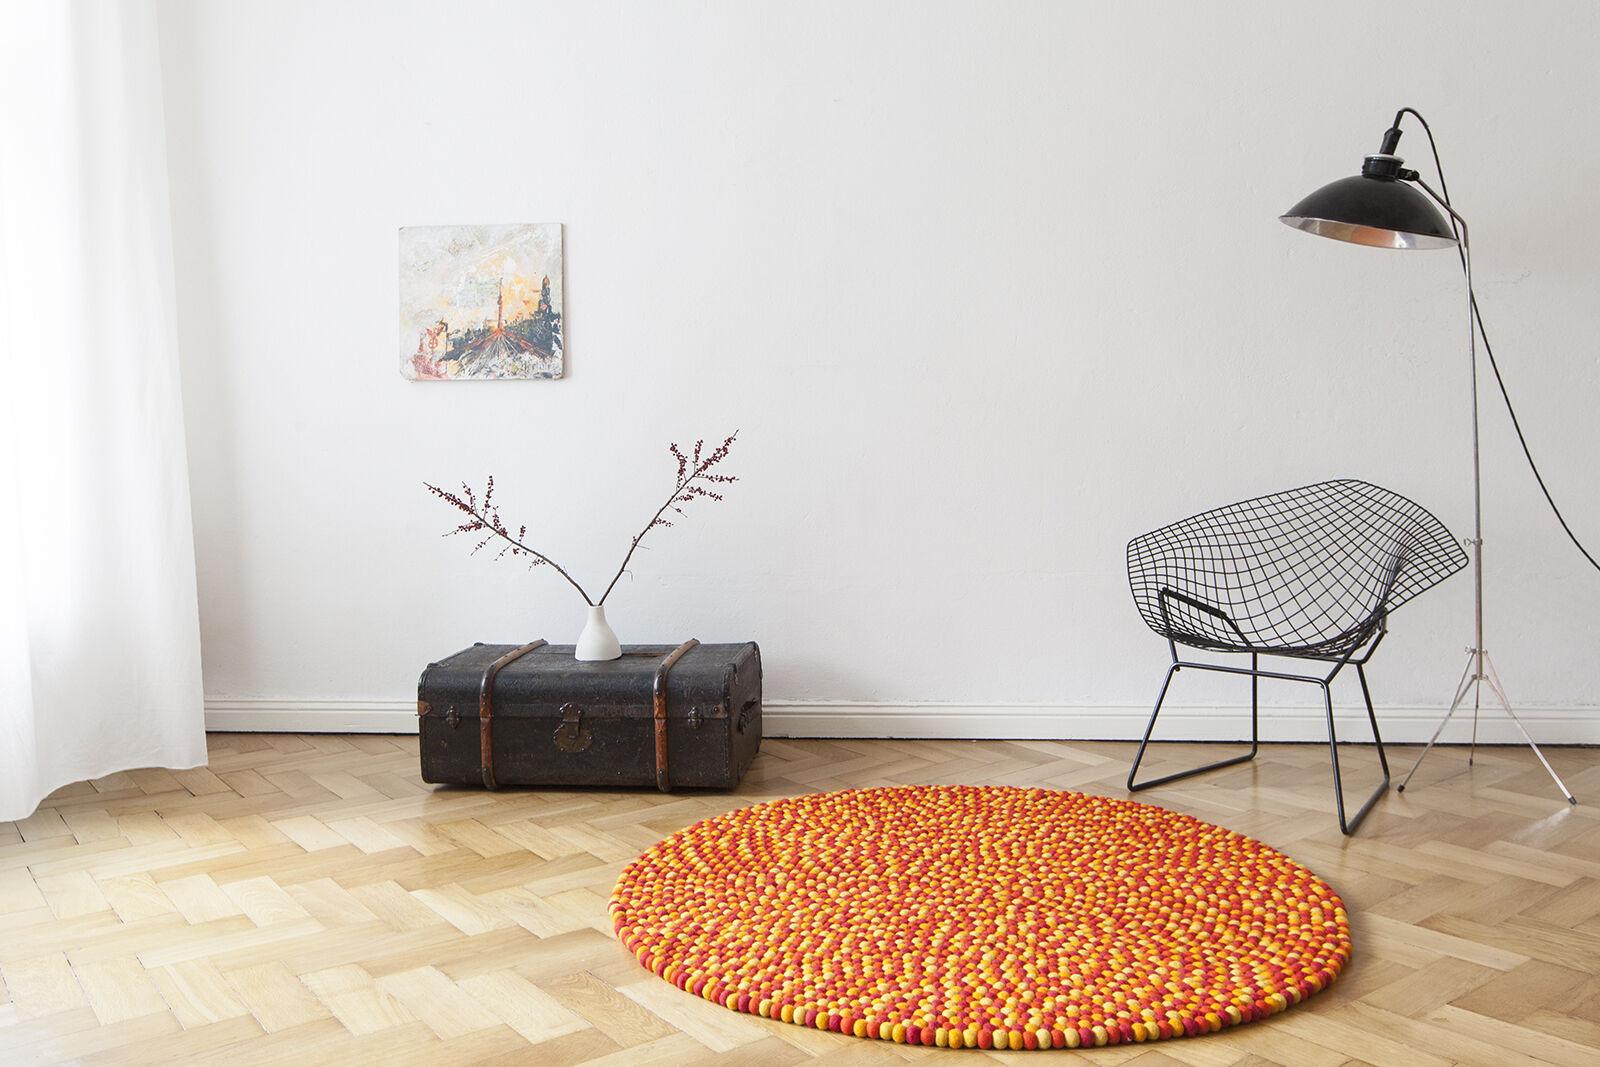 Myfelt Loni 140 140 140 cm Design rot Teppich Wolle Filz-Kugelteppich Kinderteppich bunt 24f3ea